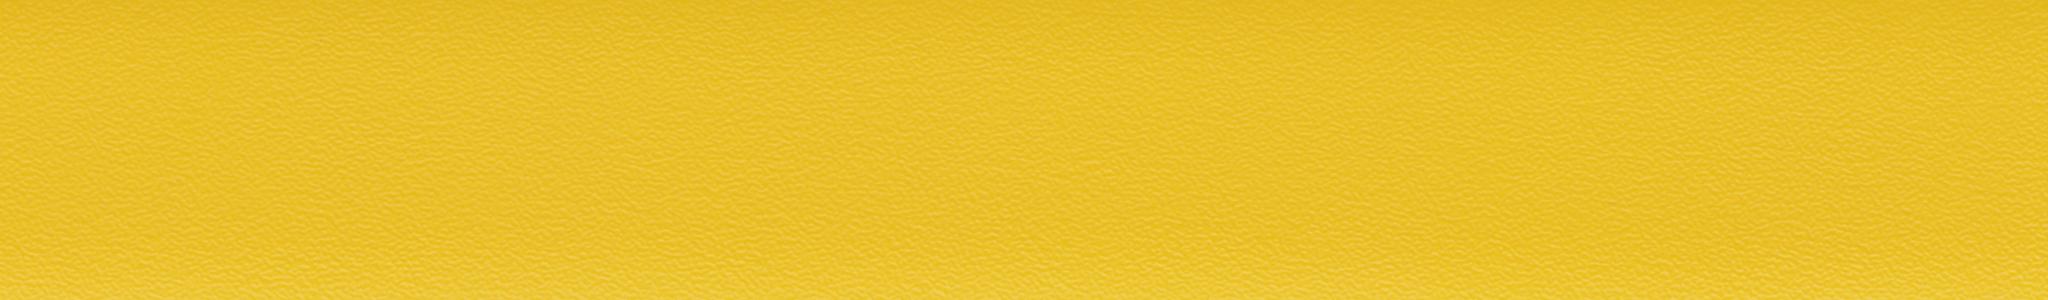 HU 11131 ABS Kante UNI Gelb perl 101